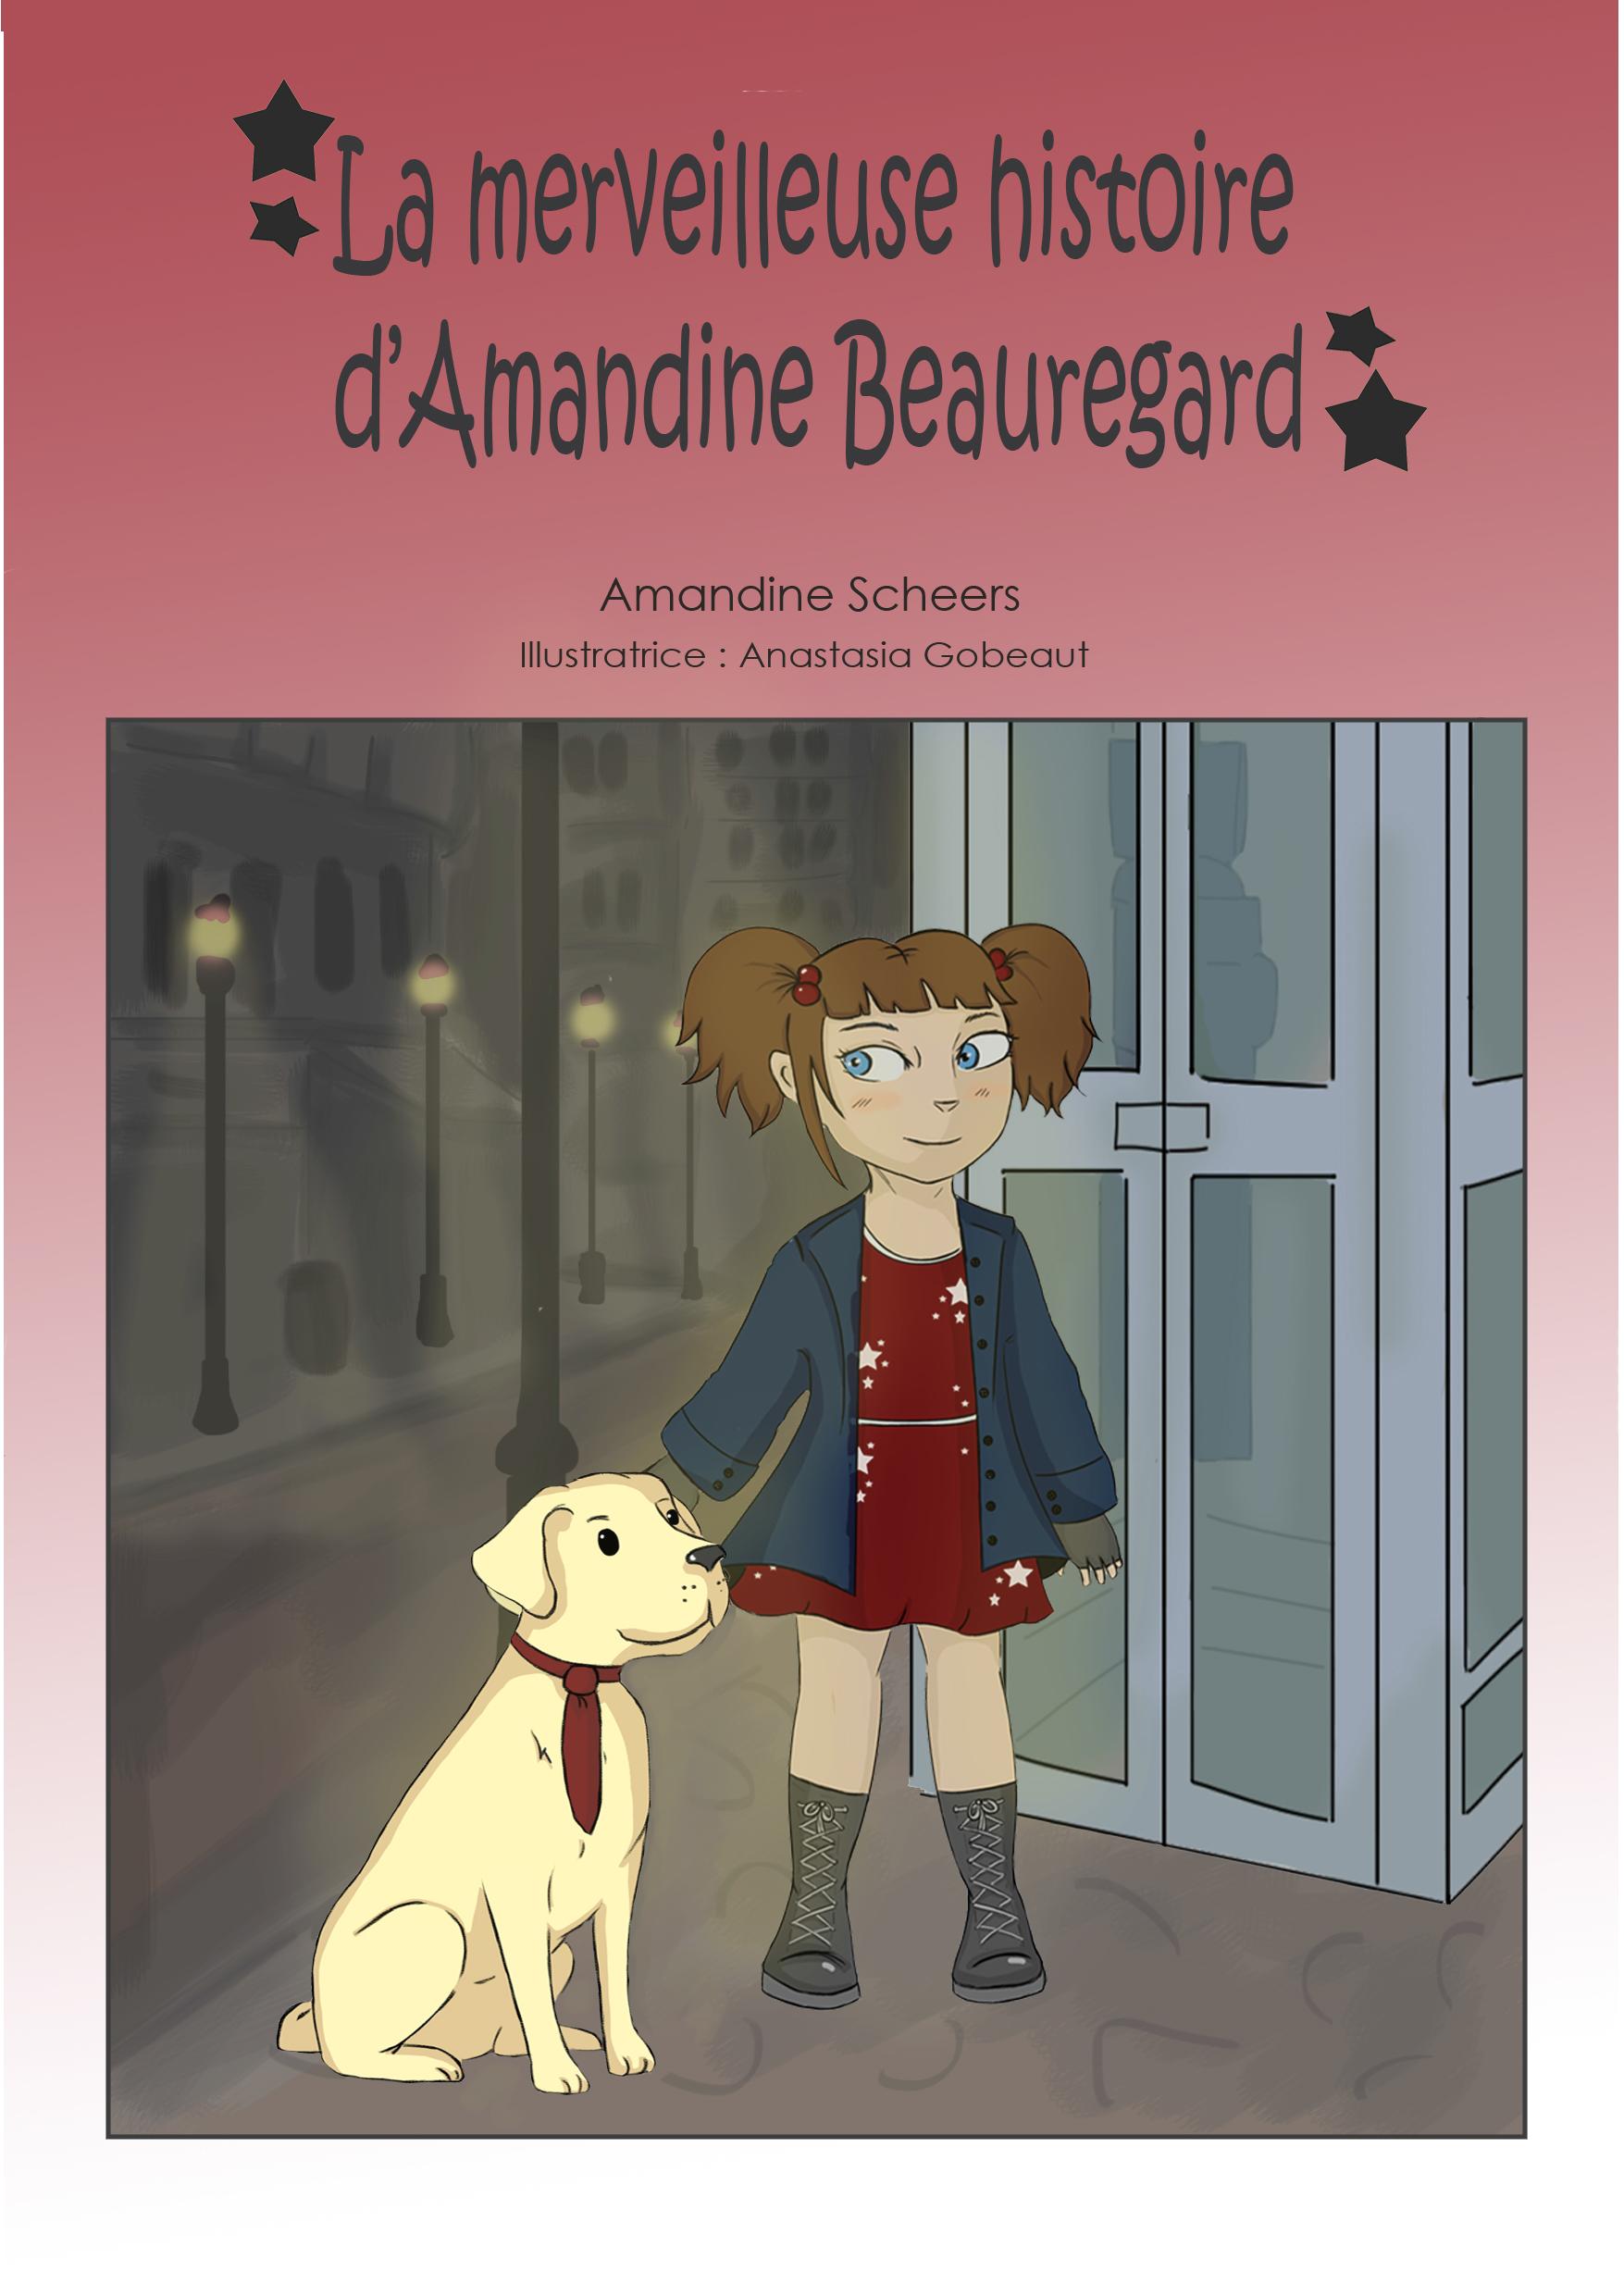 La merveilleuse histoire d'Amandine Beauregard